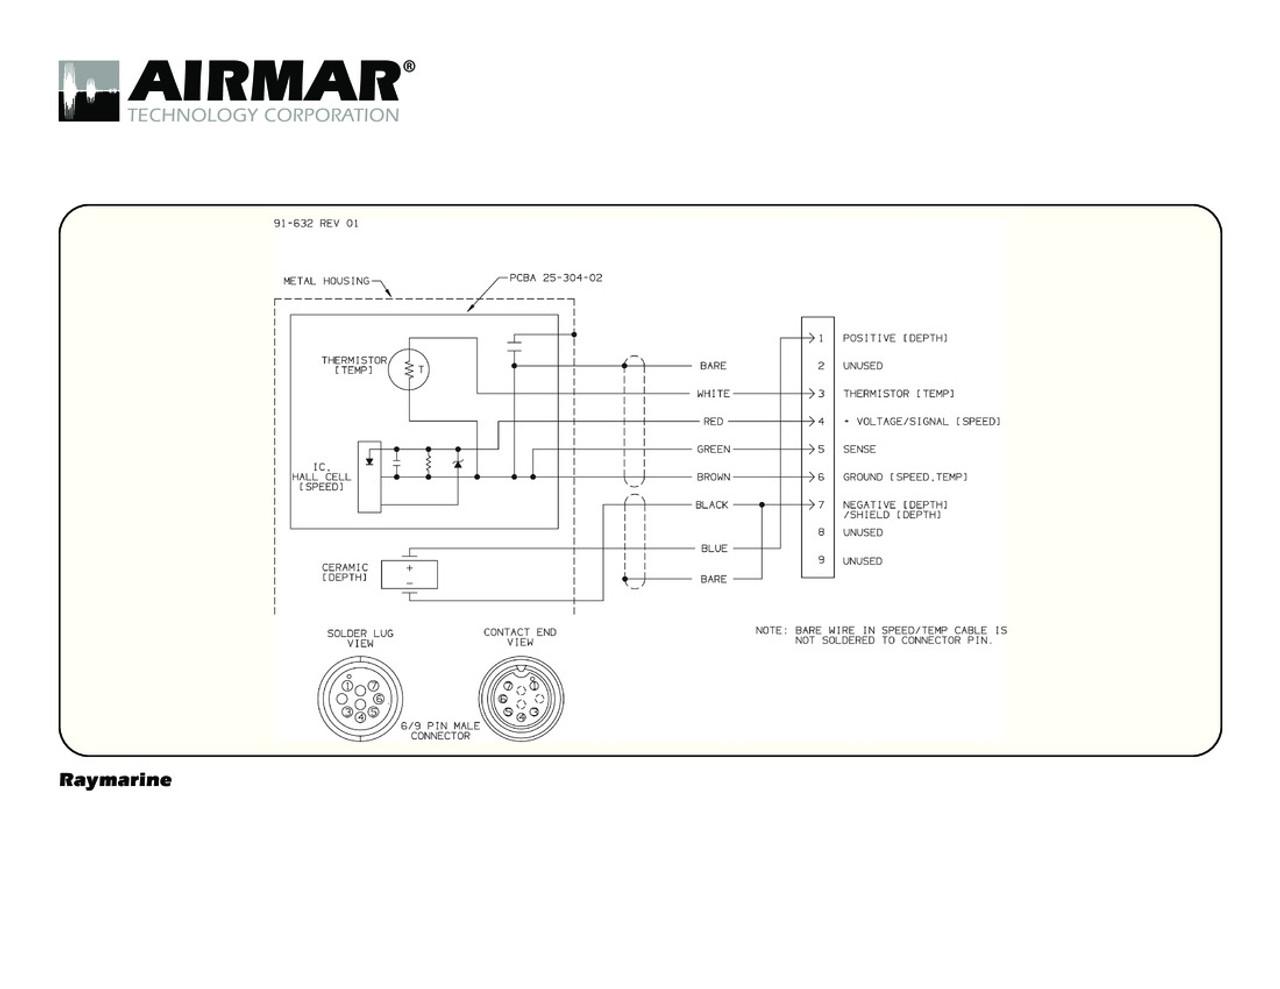 c80 wiring diagram wiring diagrams instruct Wiring Schematics raymarine wiring diagrams so schwabenschamanen de \\u2022 3 way wiring diagram c80 wiring diagram